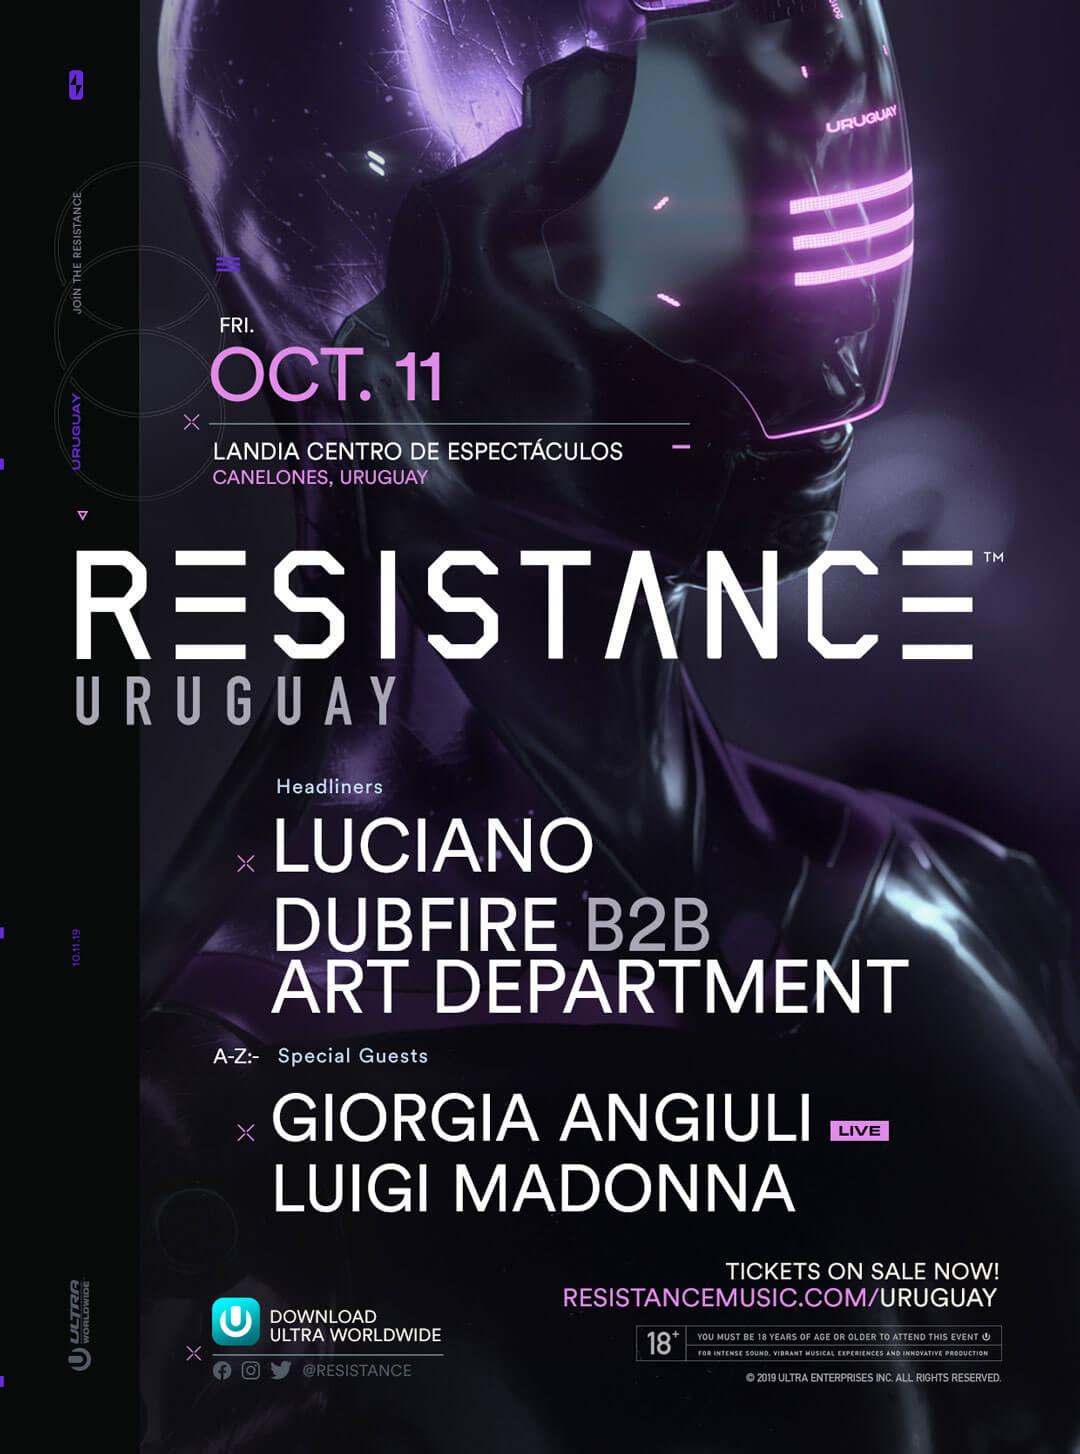 Luciano, Dubfire B2B Art Department Headline RESISTANCE Uruguay Lineup